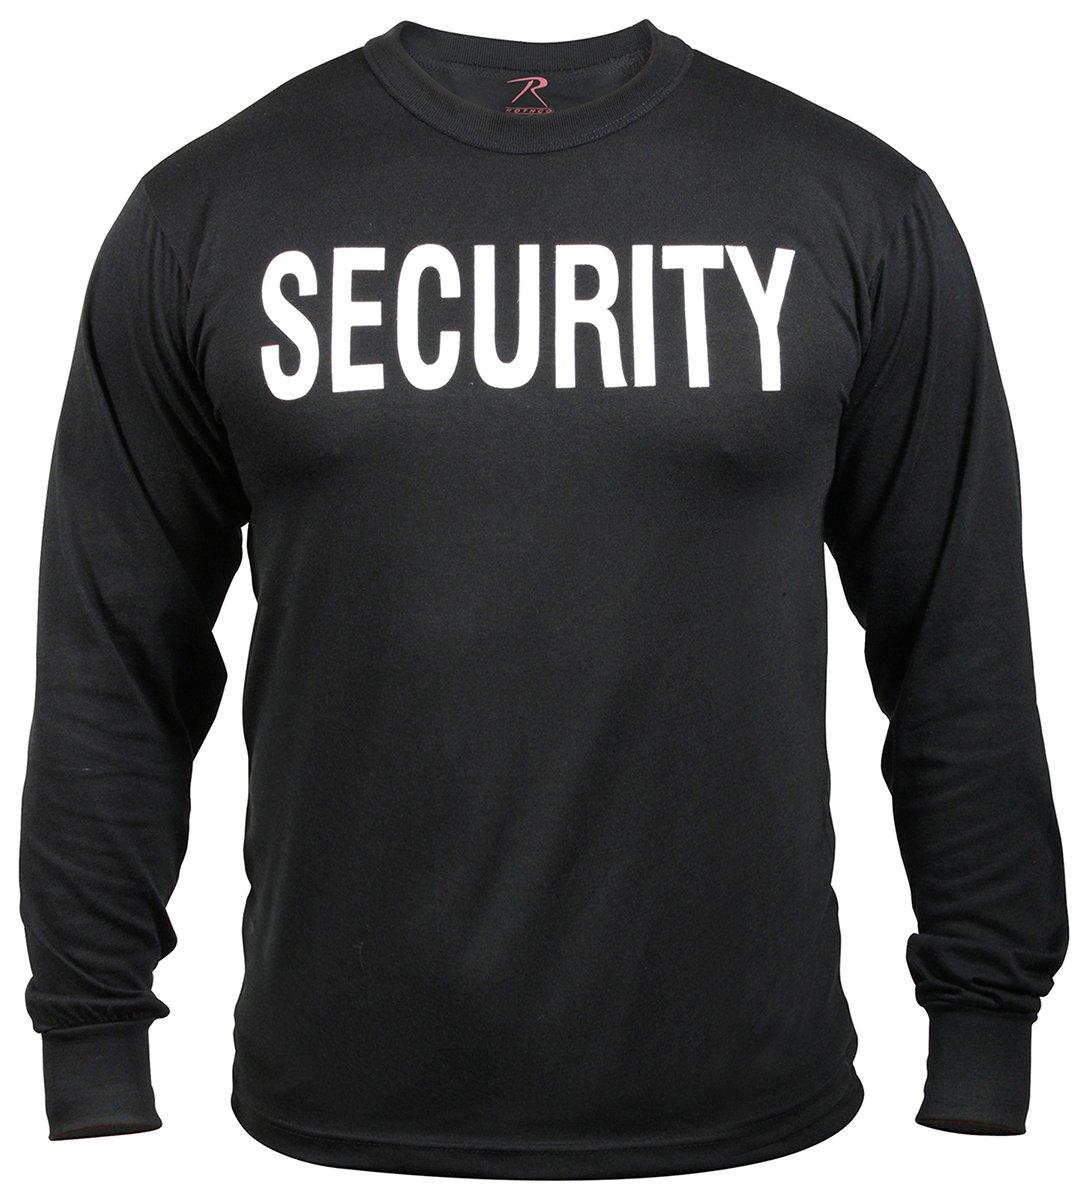 Rothco 2-Sided Long Sleeve Security T-Shirt